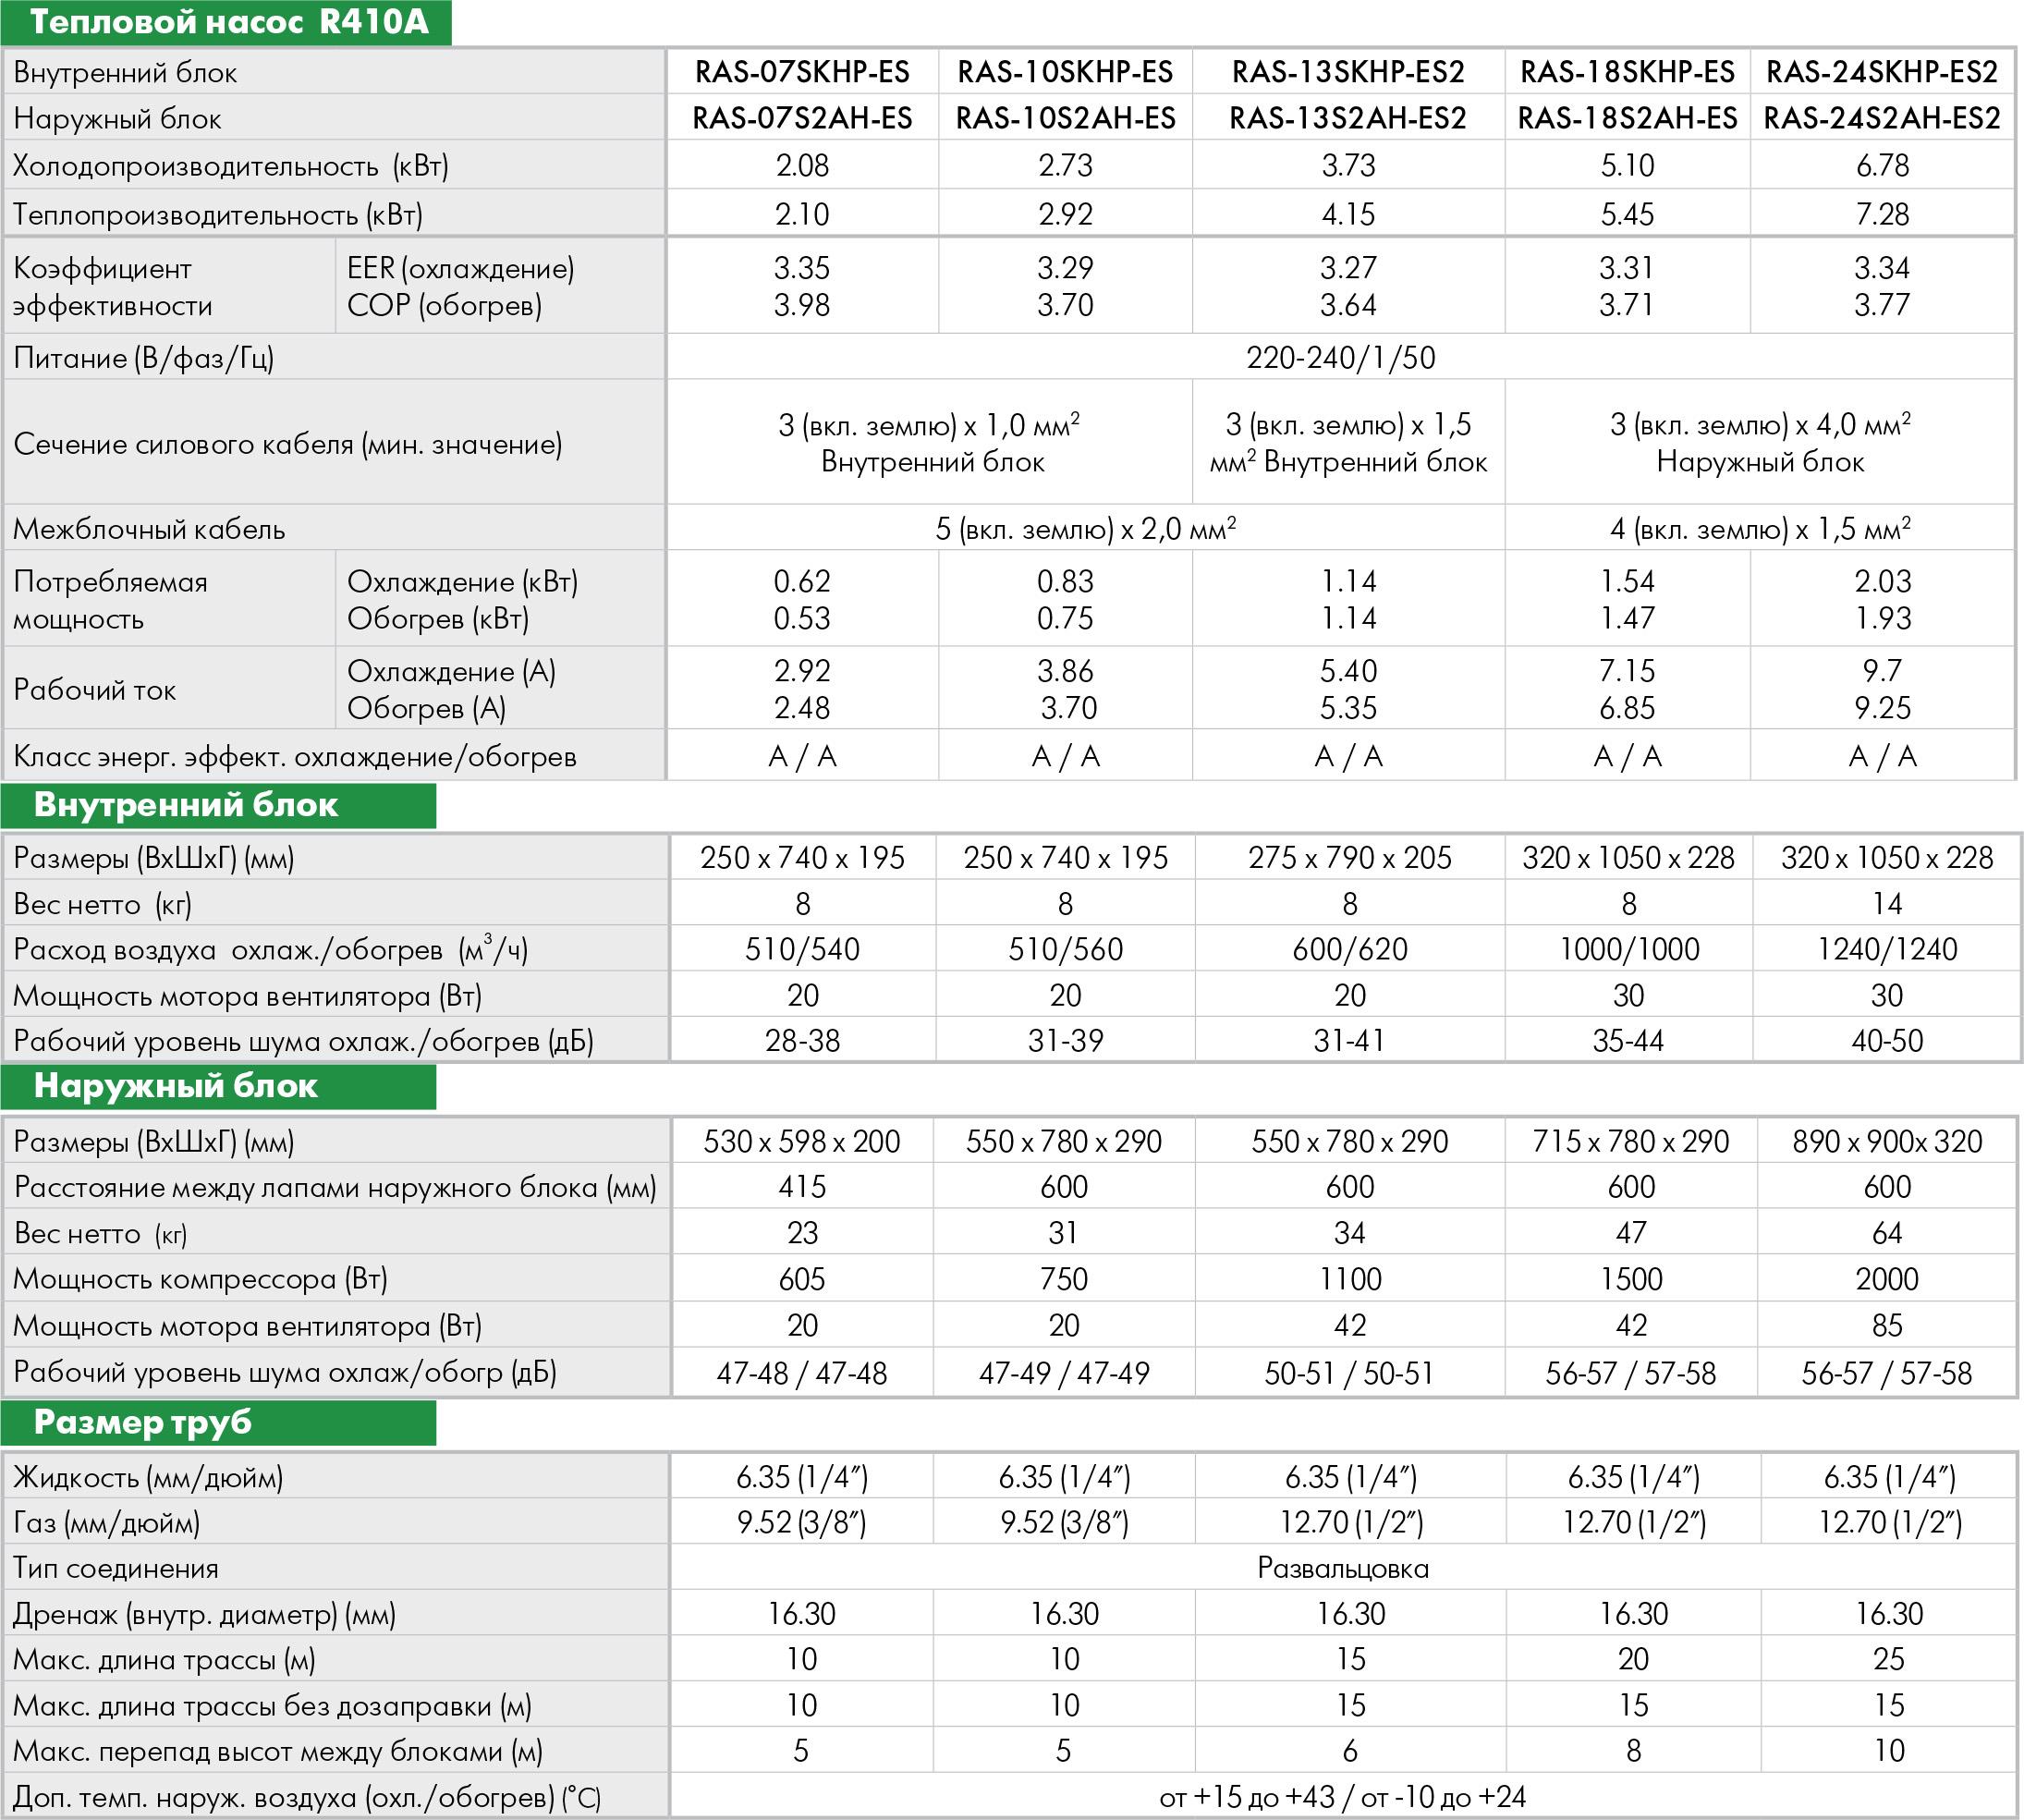 Технические характеристики кондиционера Toshiba RAS-07SKHP-ES / RAS-07S2AH-ES серии SKHP